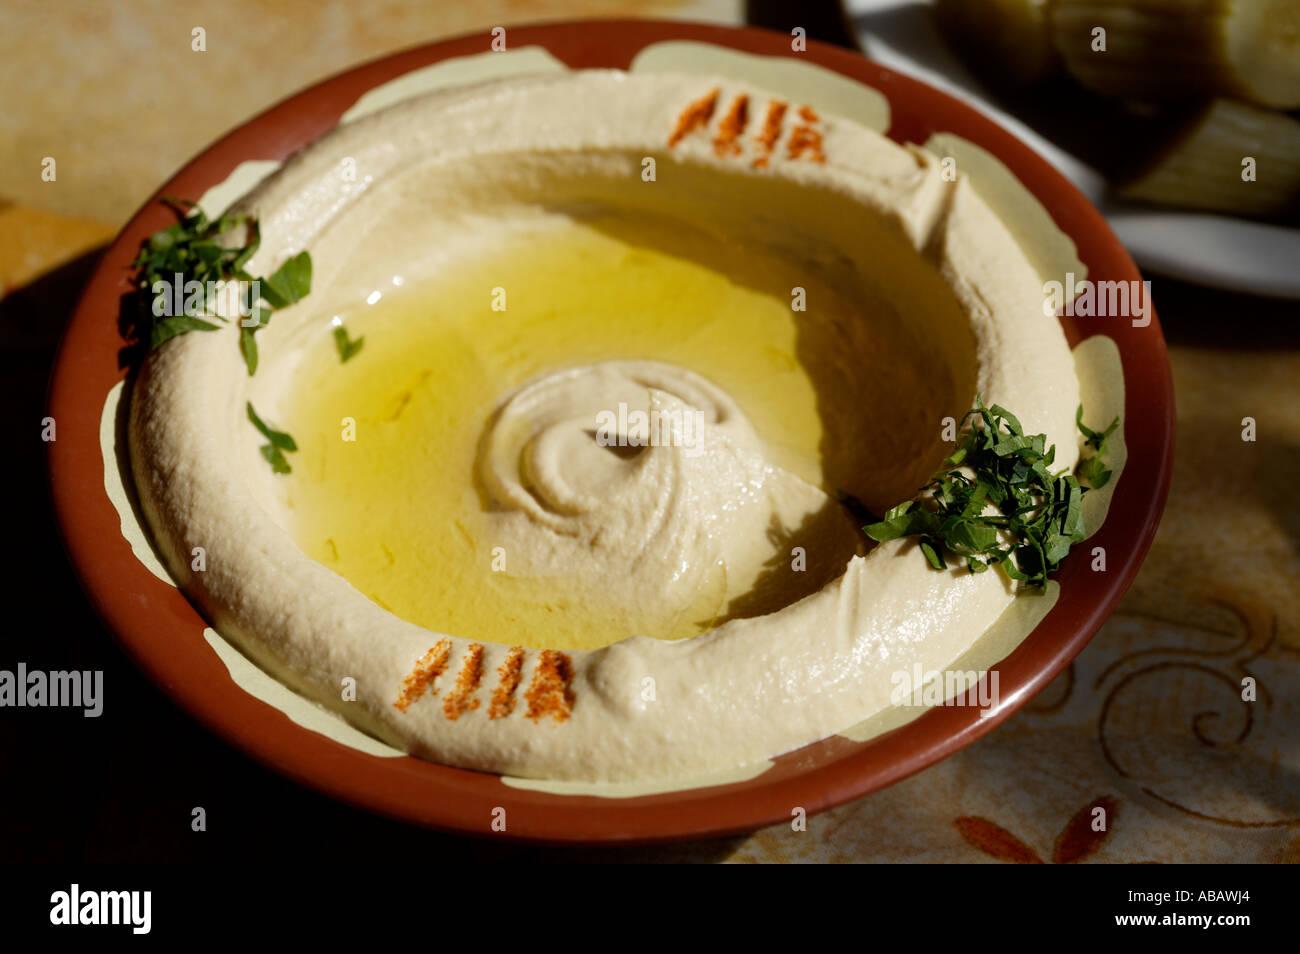 UAE, Dubai, Hummus - Stock Image